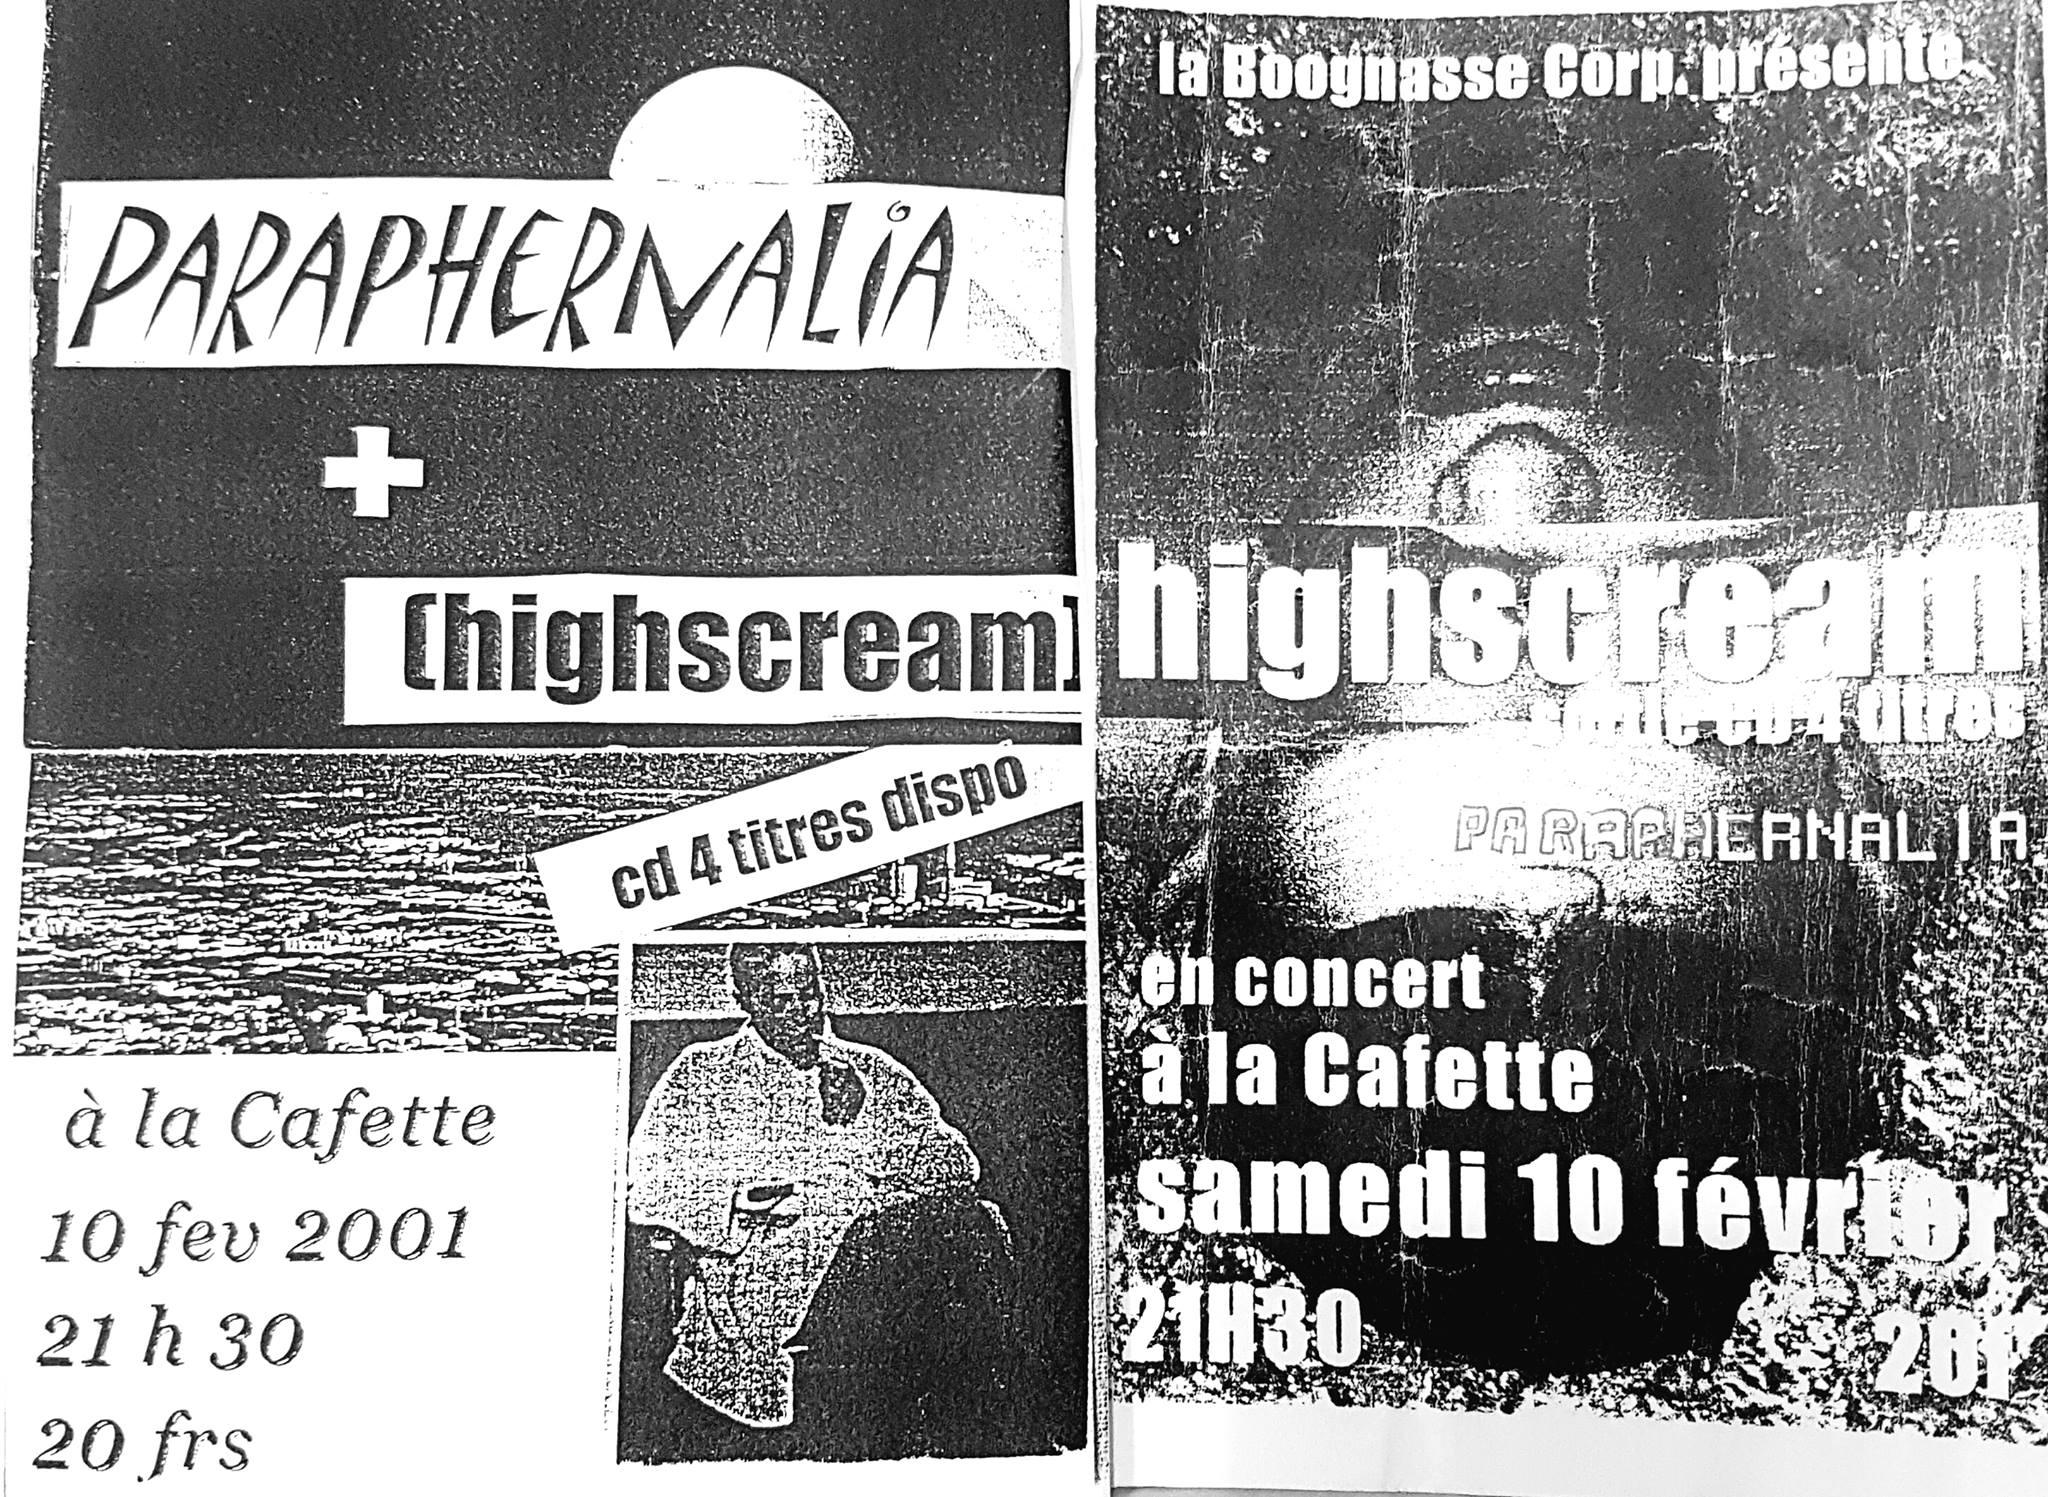 "10 février 2001 Paraphernalia, HighScream au Havre ""Cafette"""